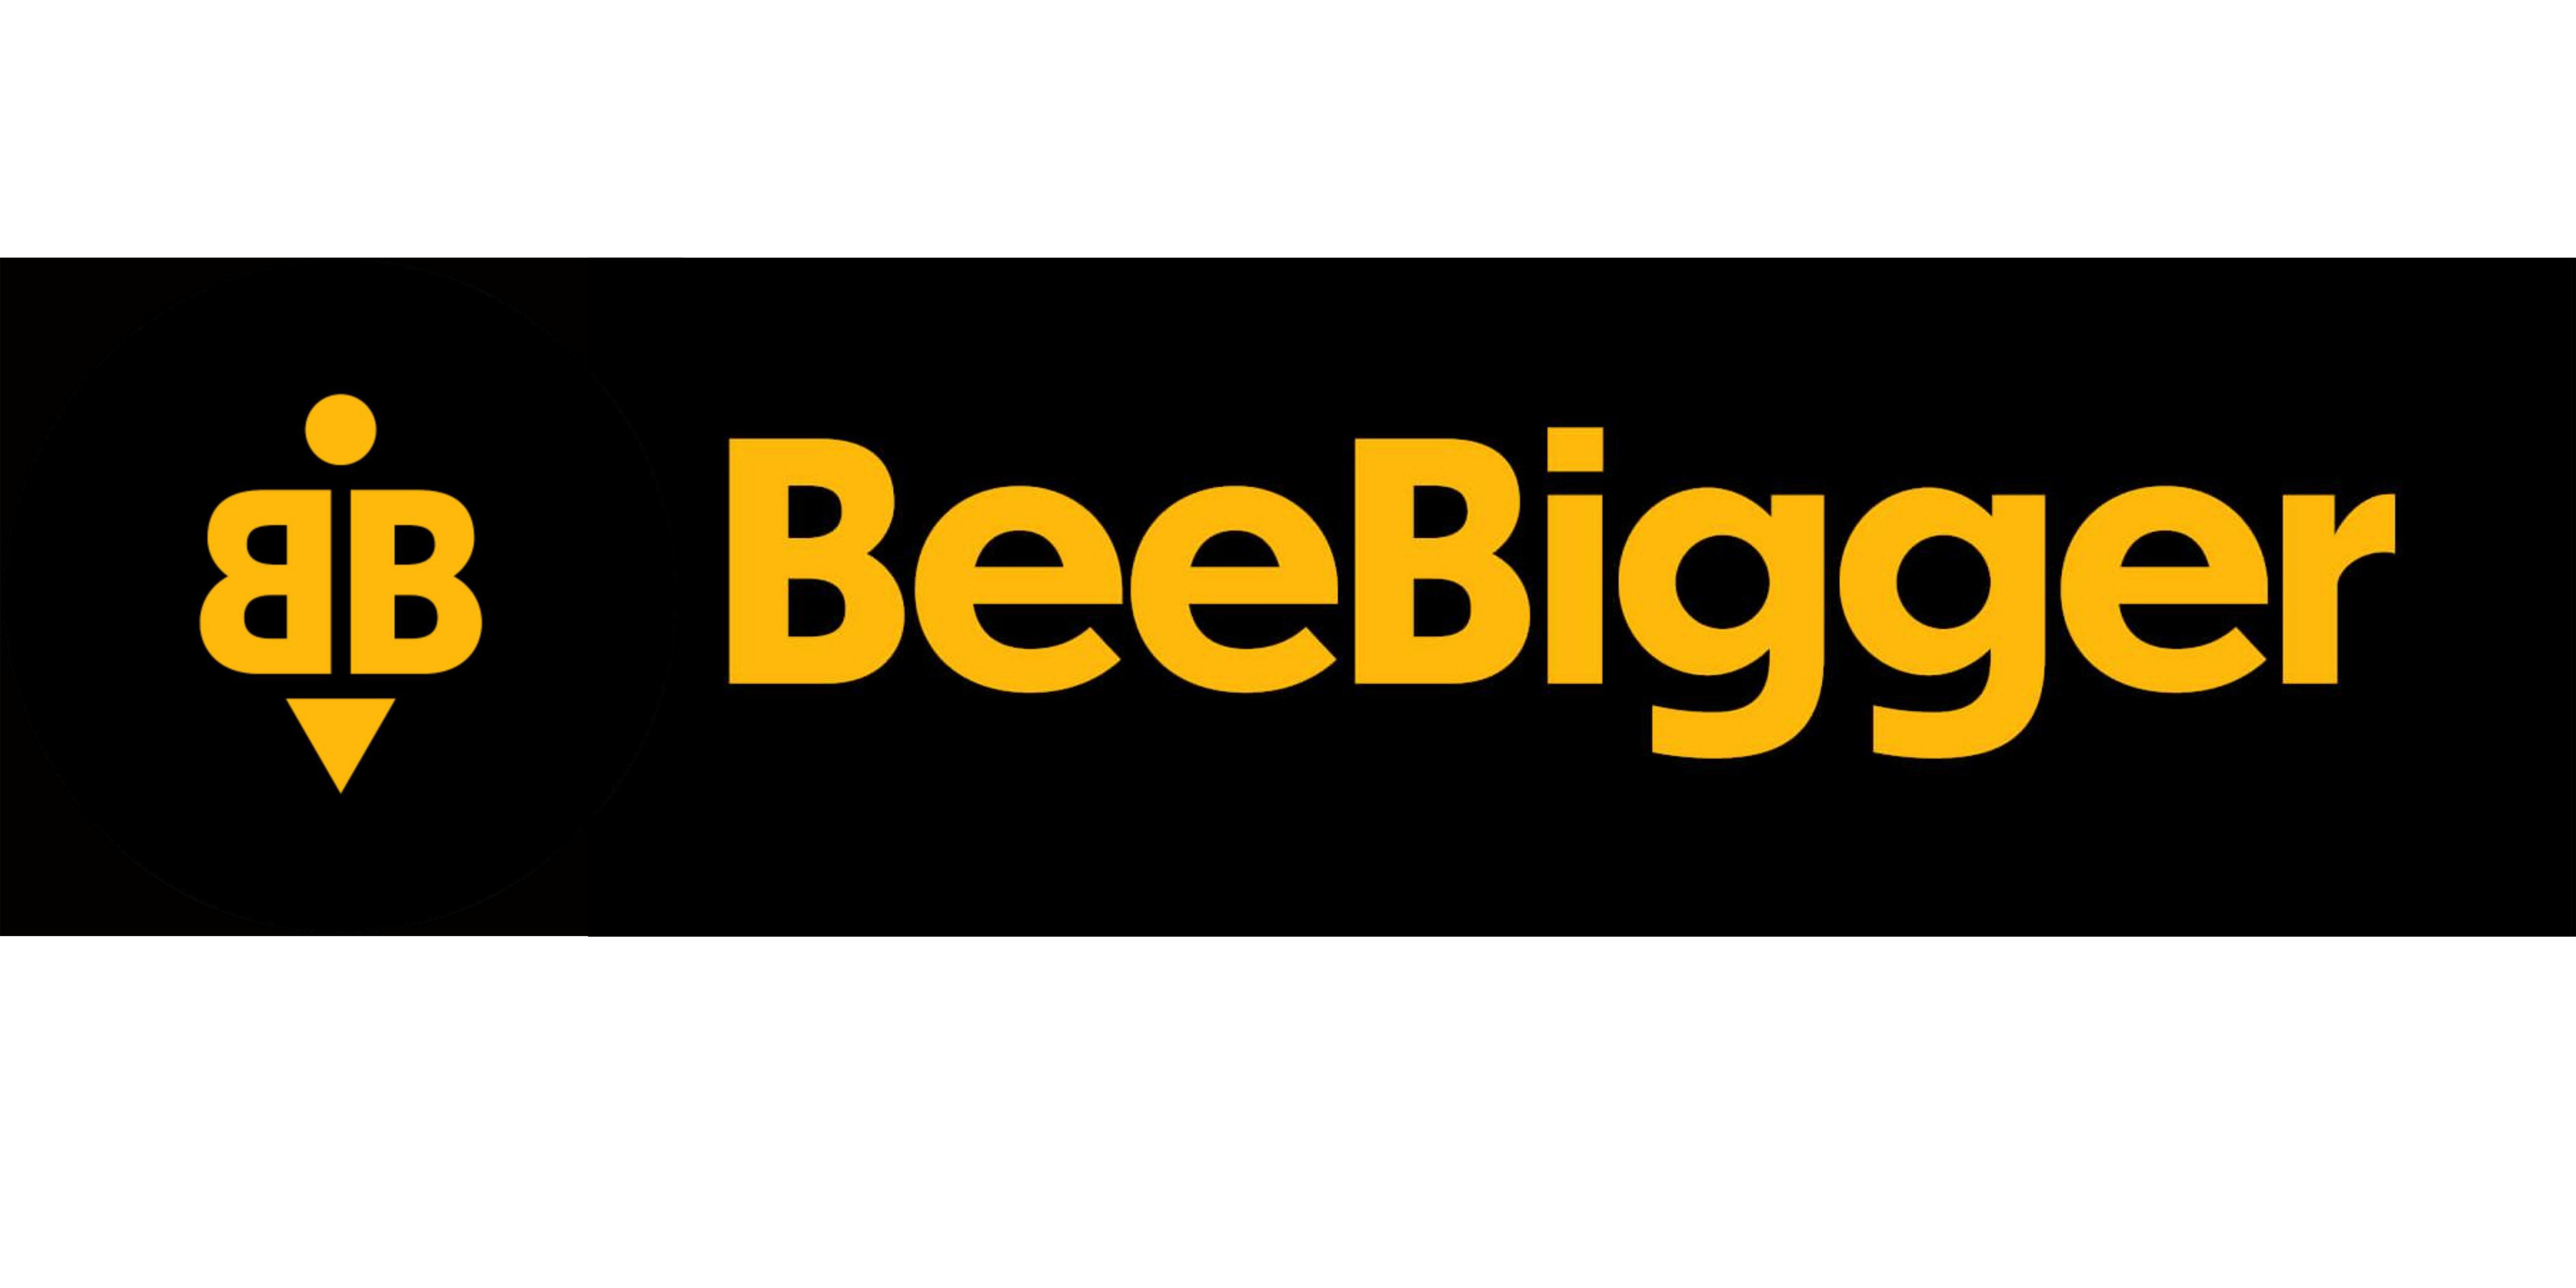 https://beebigger.com/wp-content/uploads/2021/07/beebigger-double-logo.png